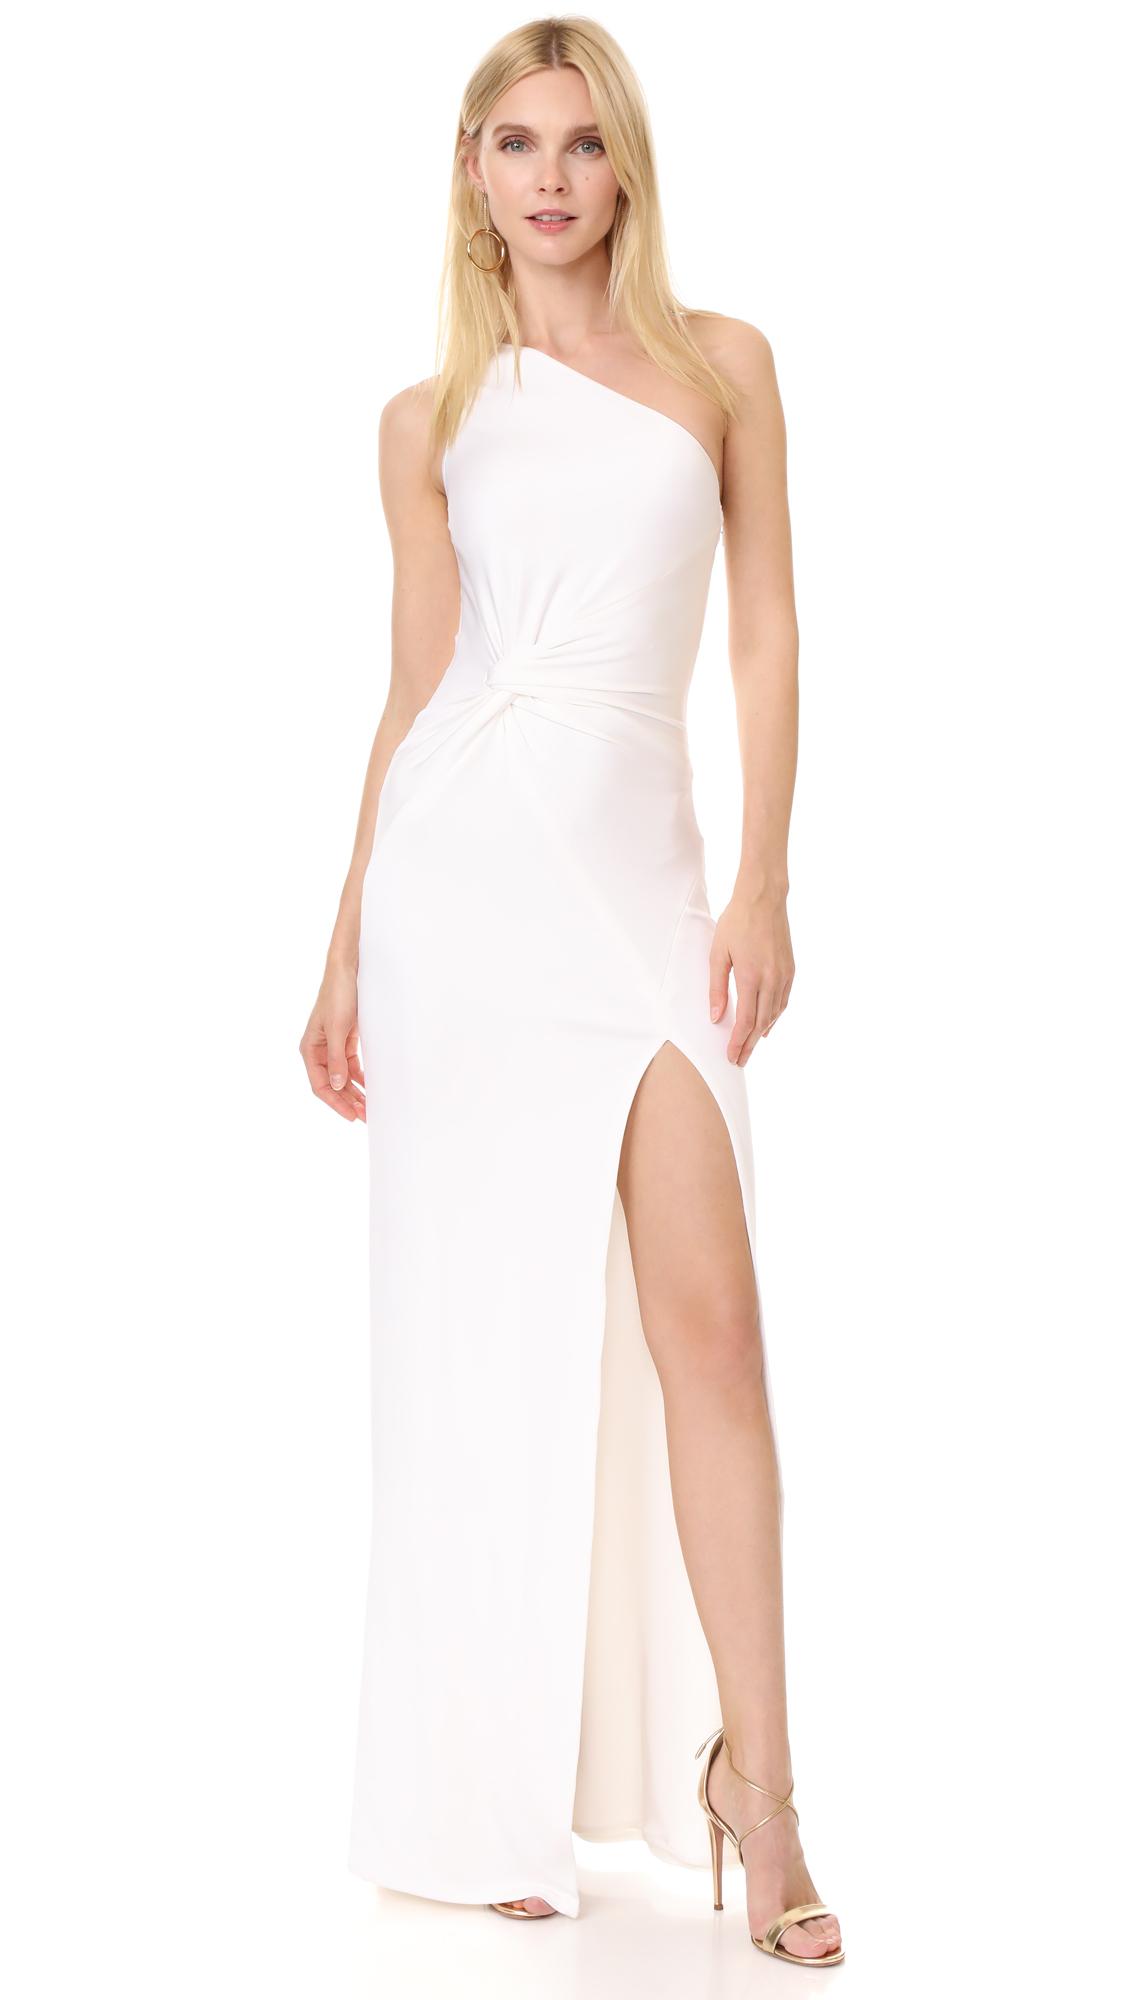 Cushnie Et Ochs Gown - White